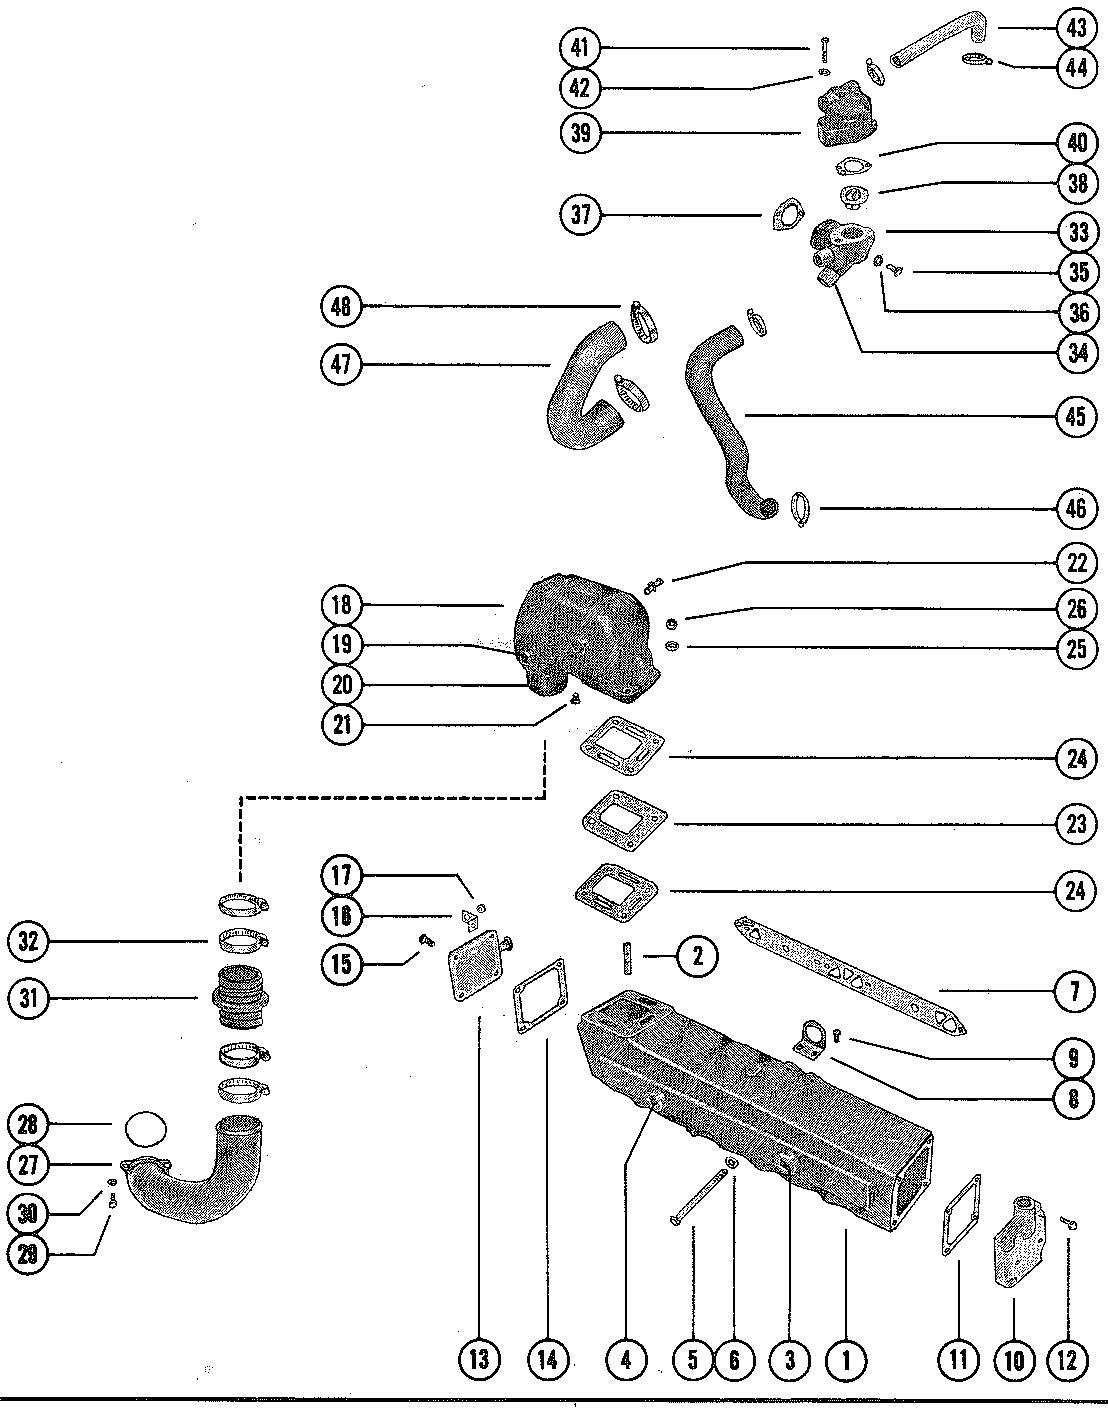 Mallory Distributor Wiring   Wiring Diagram Database on